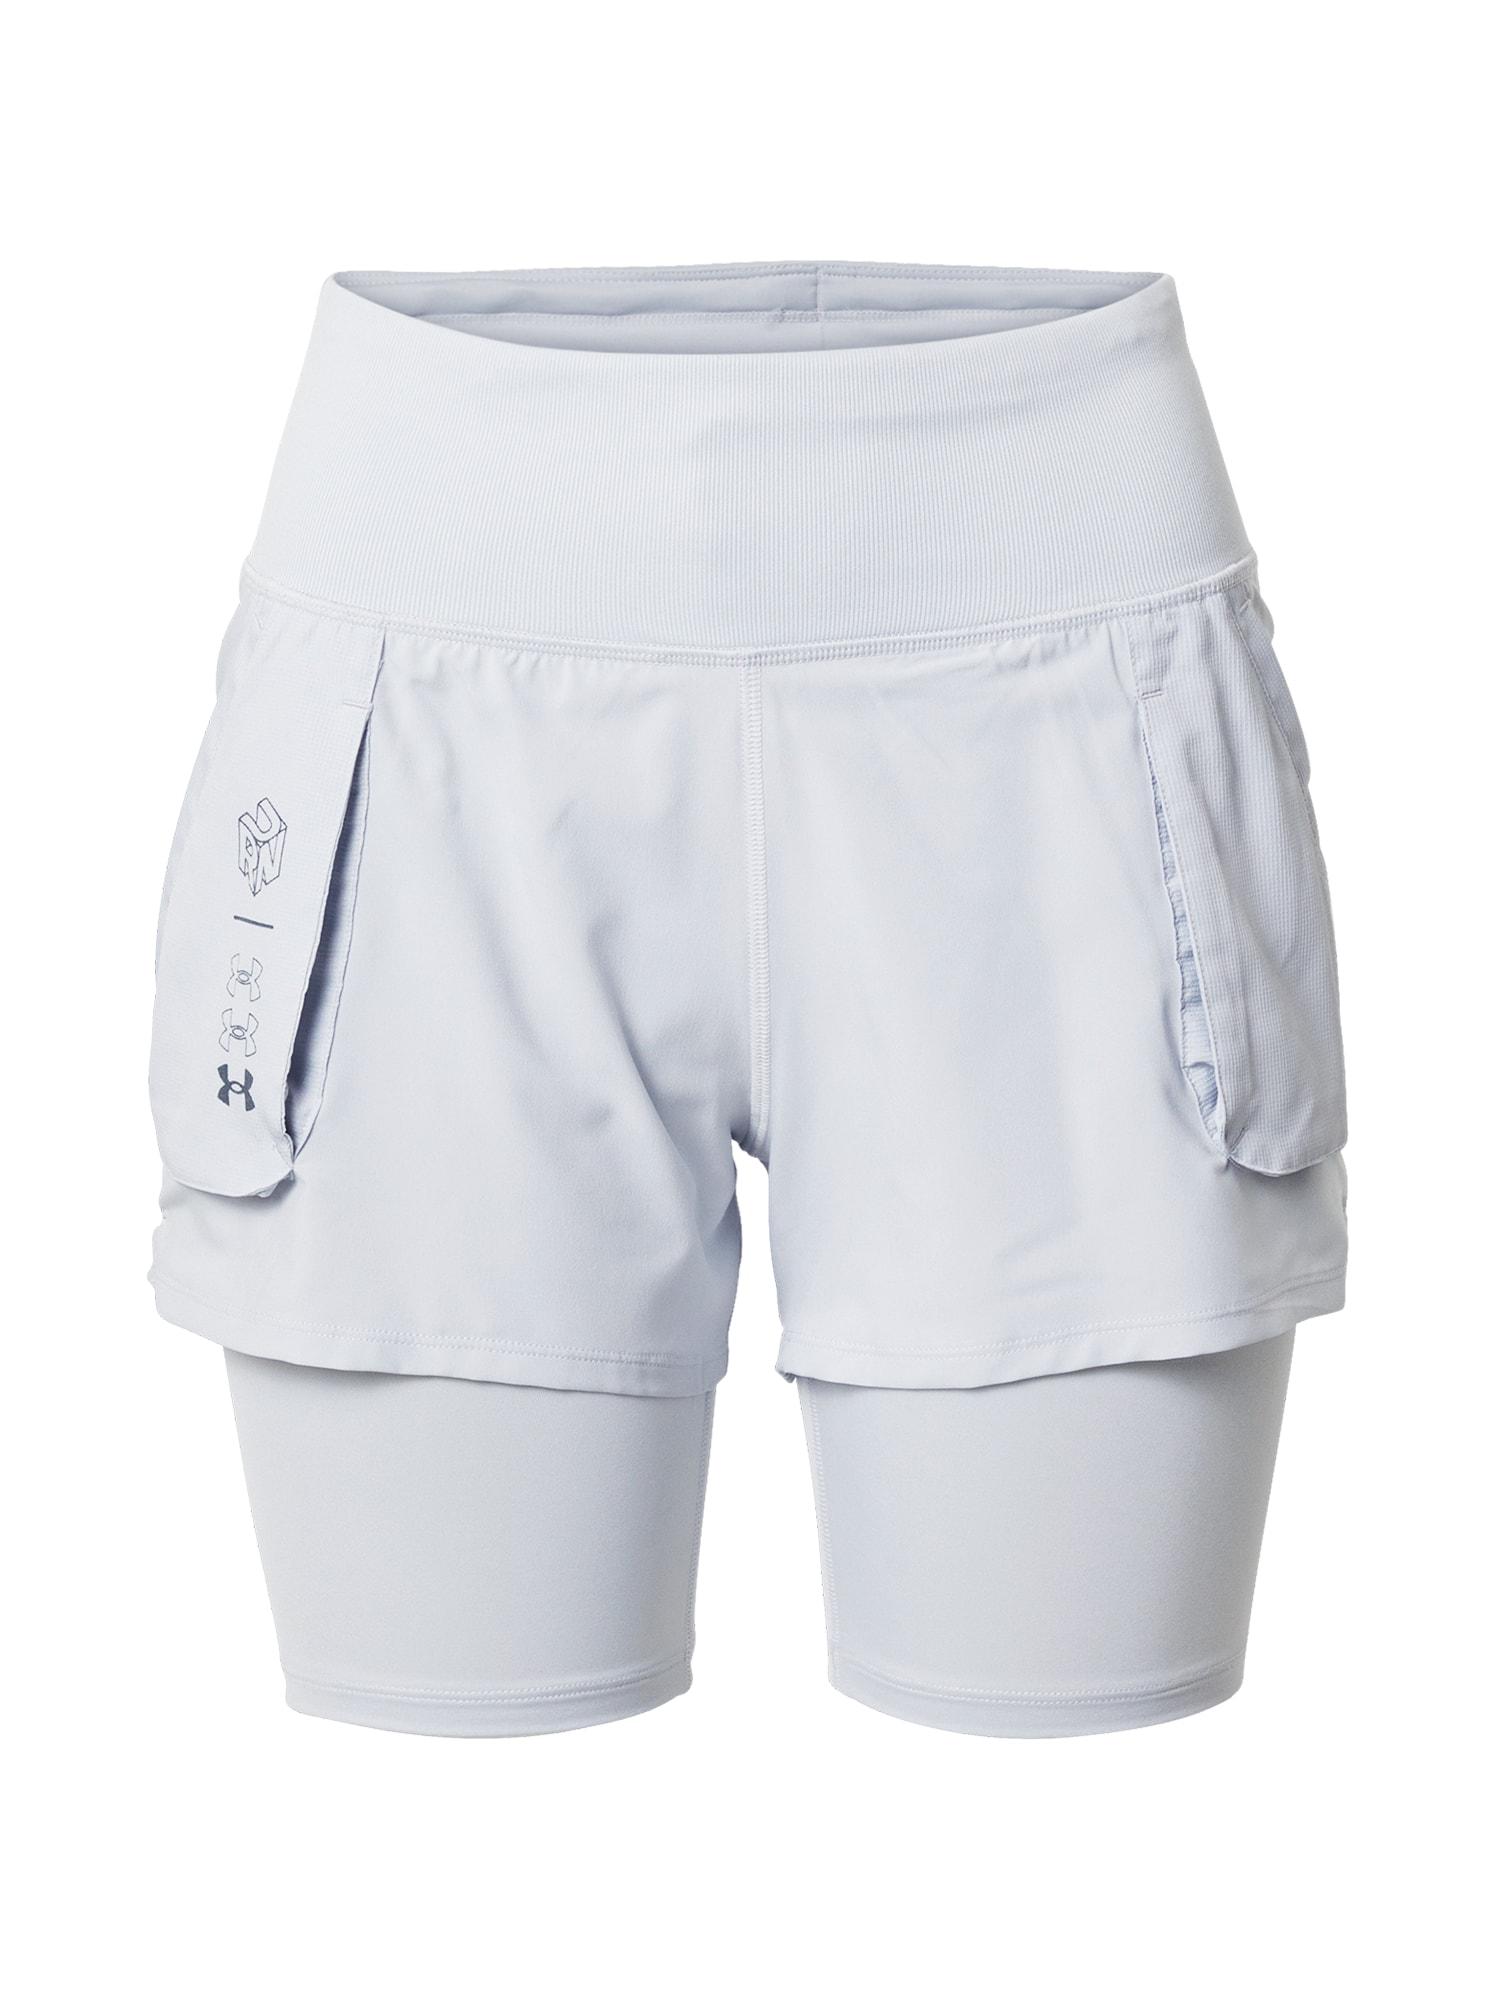 UNDER ARMOUR Sportovní kalhoty 'Run Anywhere 2in1'  šedá